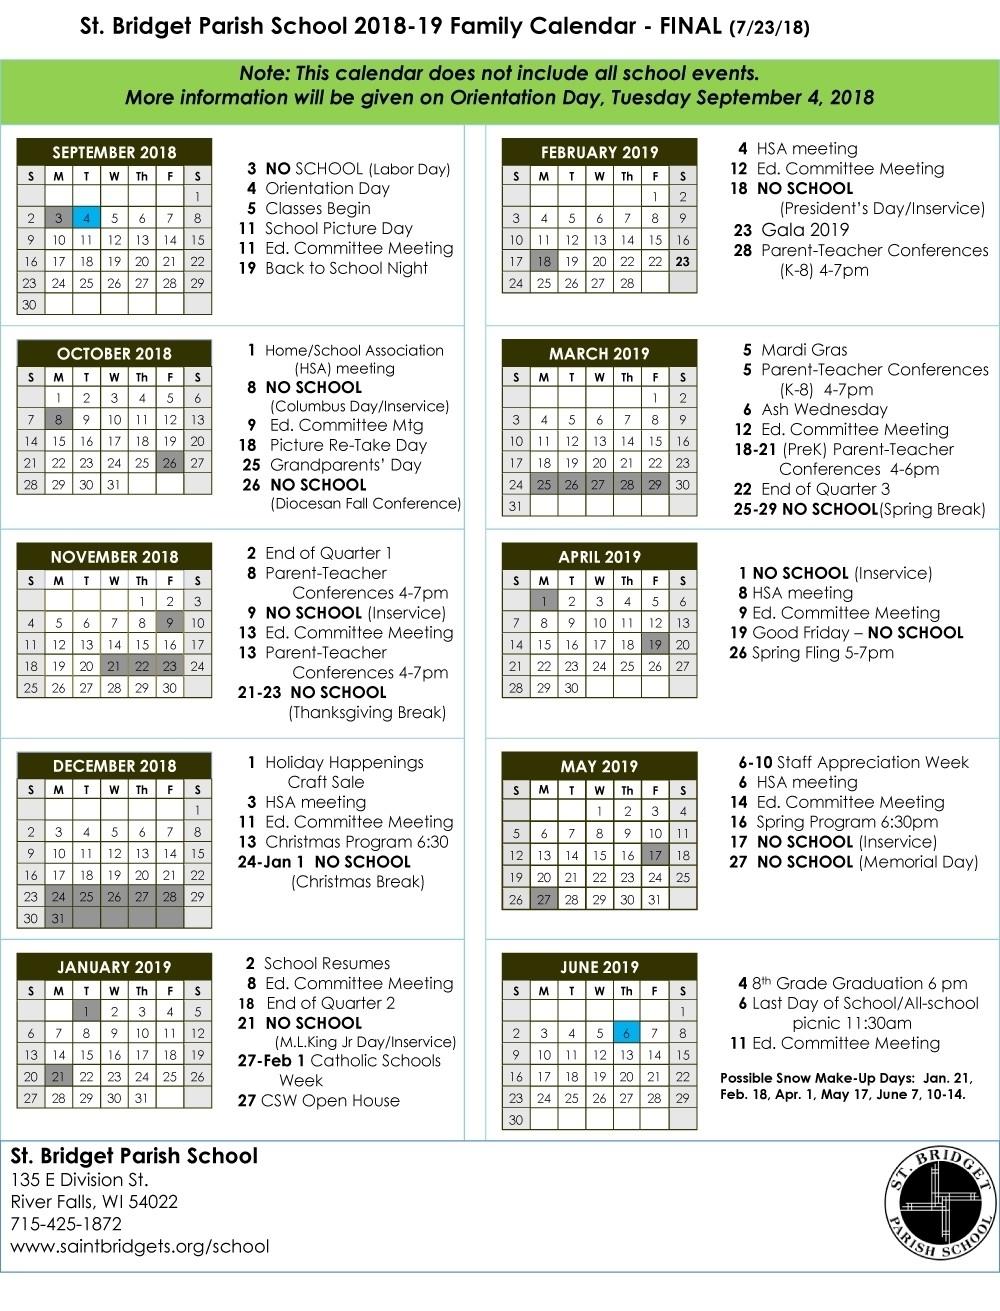 Free Printable Catholic Liturgical Calendar 2020 : printable, catholic, liturgical, calendar, Printable, Liturgical, Calendar, Methodist, Church, While, Usages, Functions,, Complex.